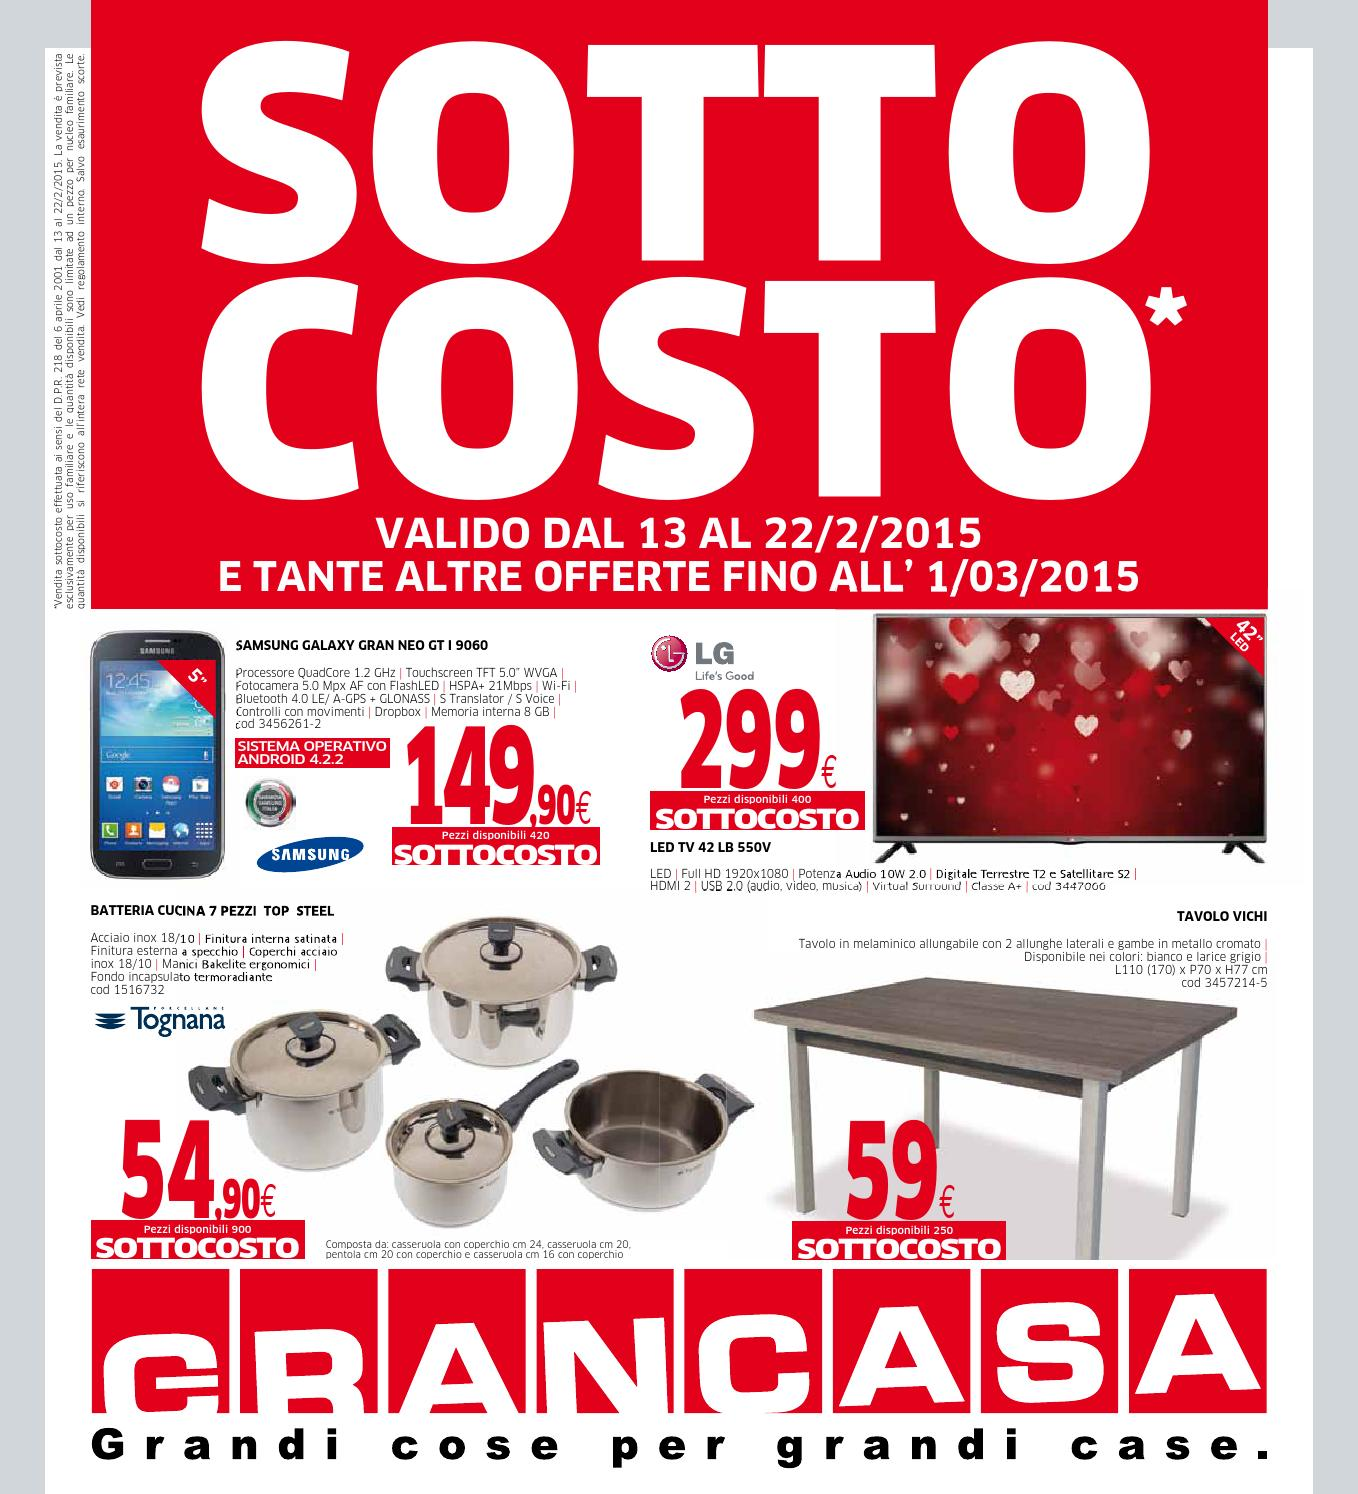 Grancasa 22feb by volavolantino issuu - Grancasa catalogo ...